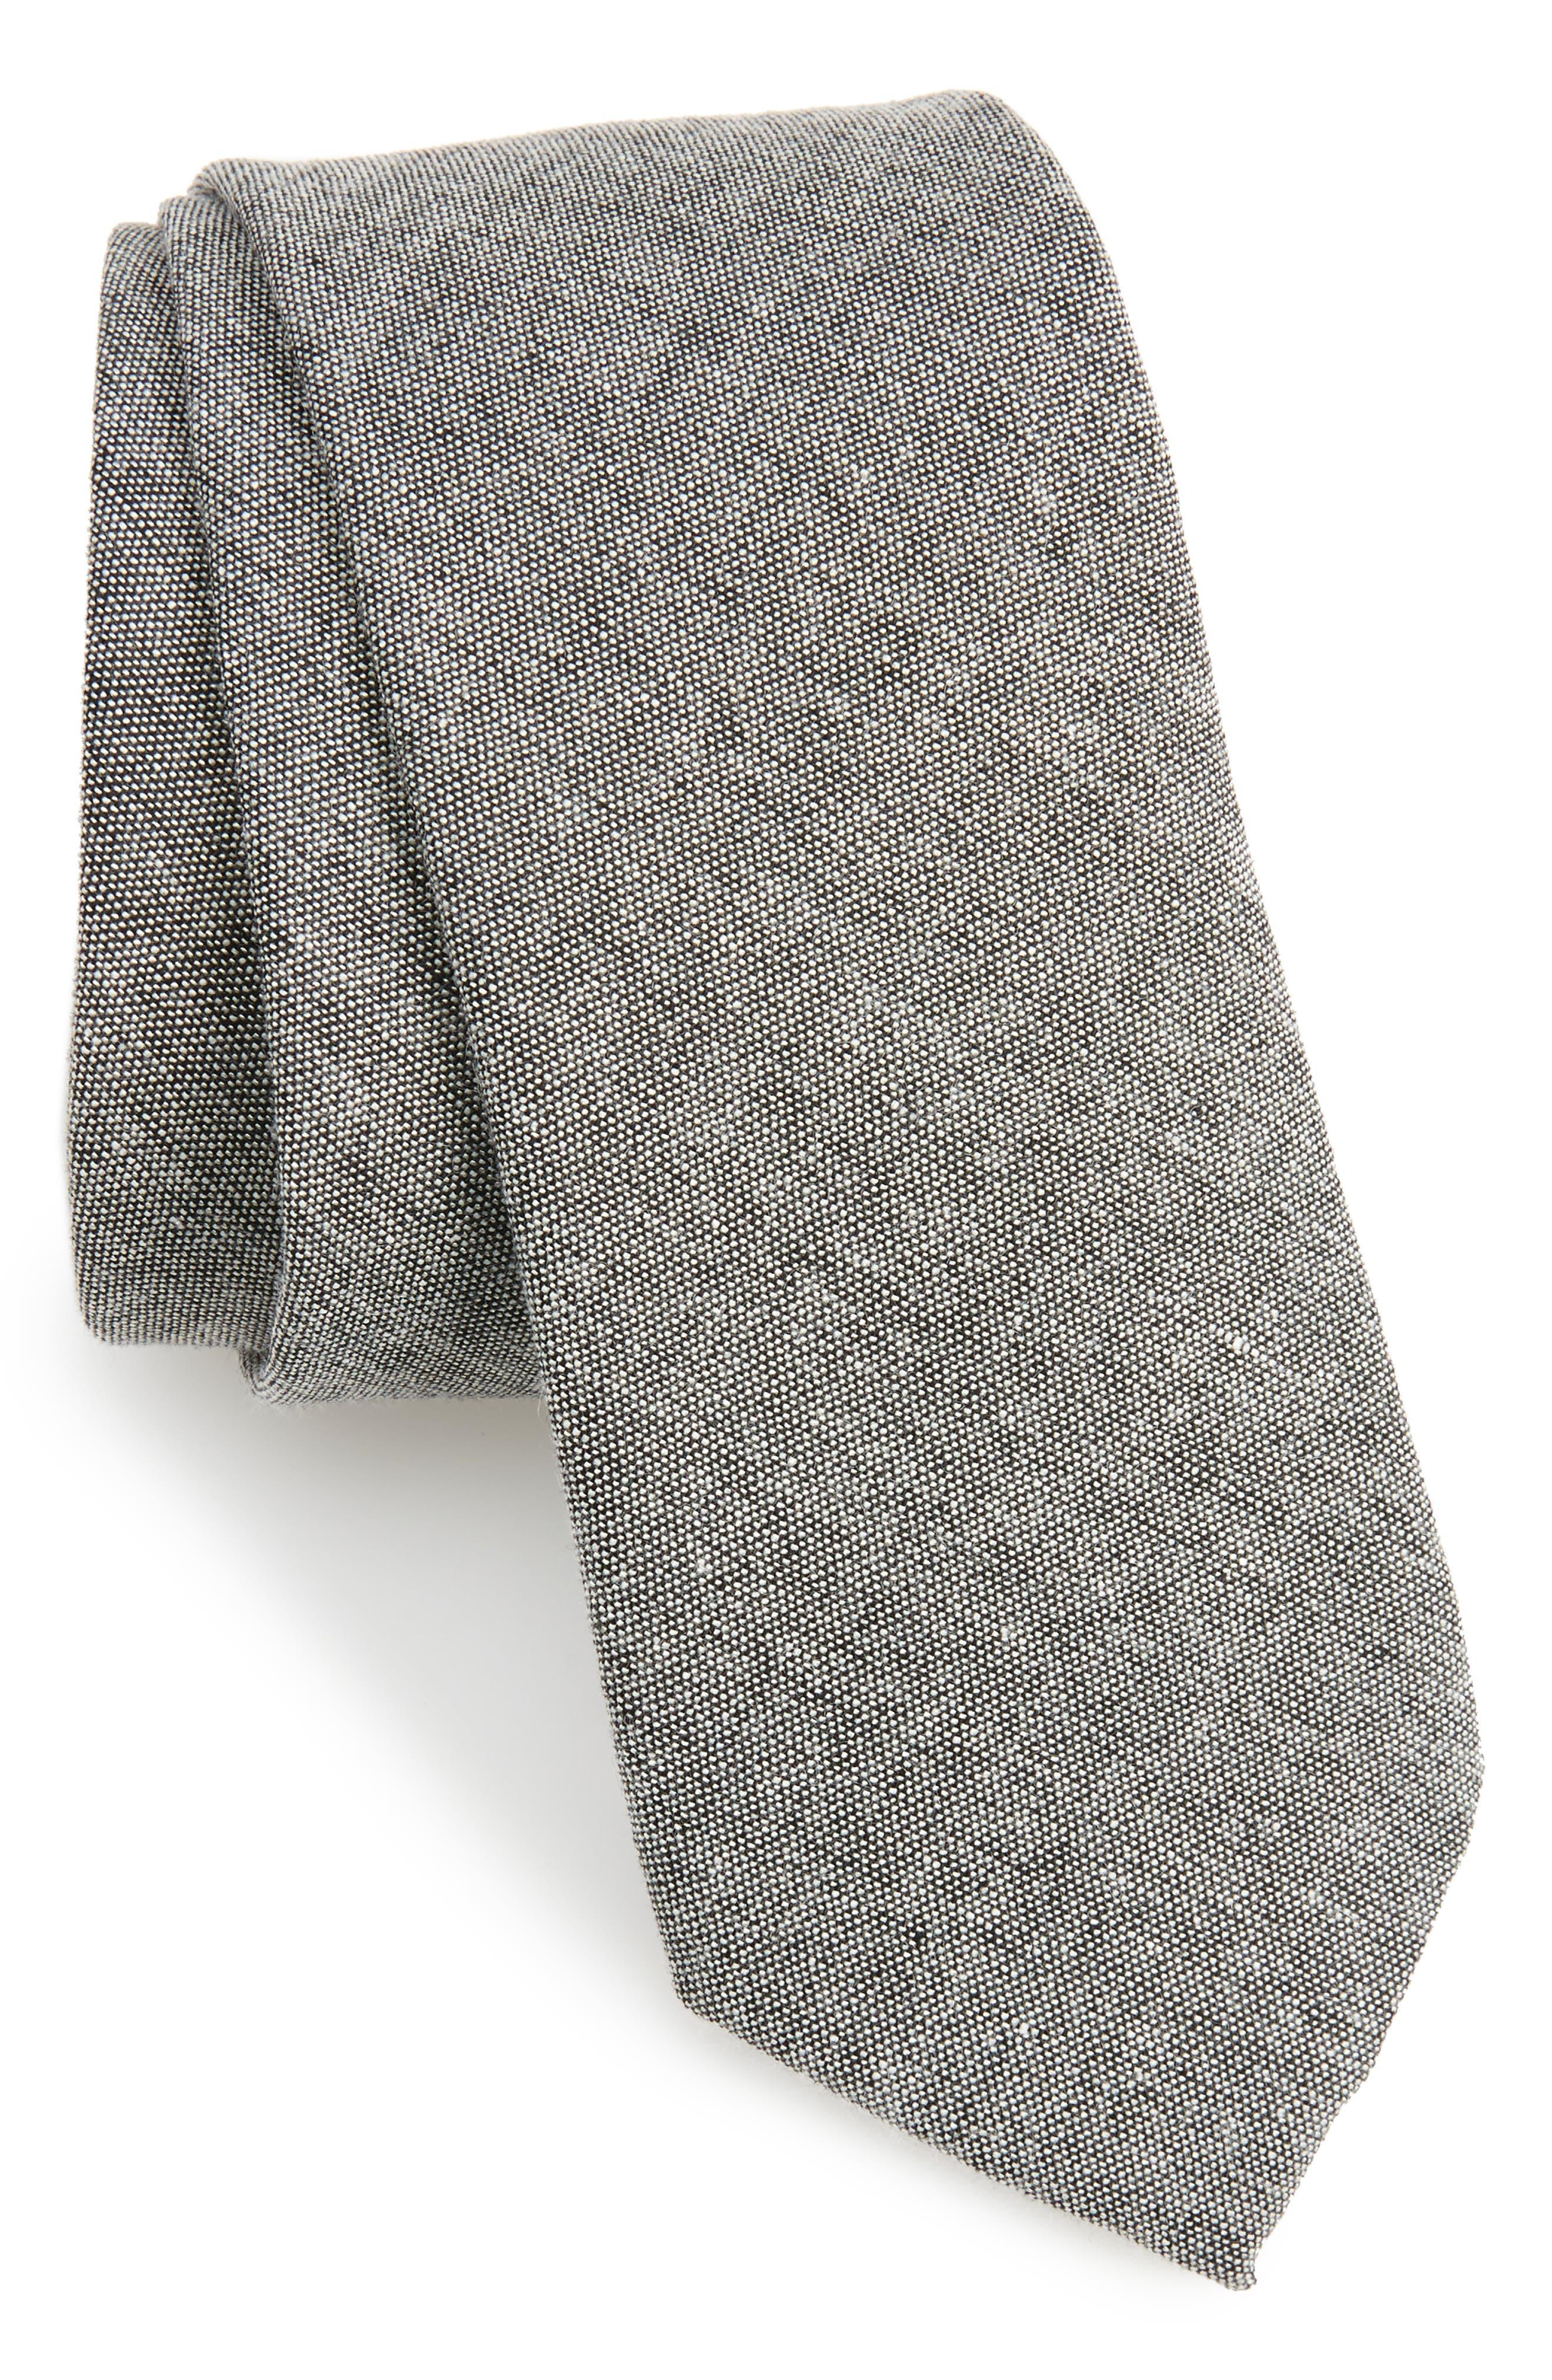 Textured Skinny Tie,                         Main,                         color, 001